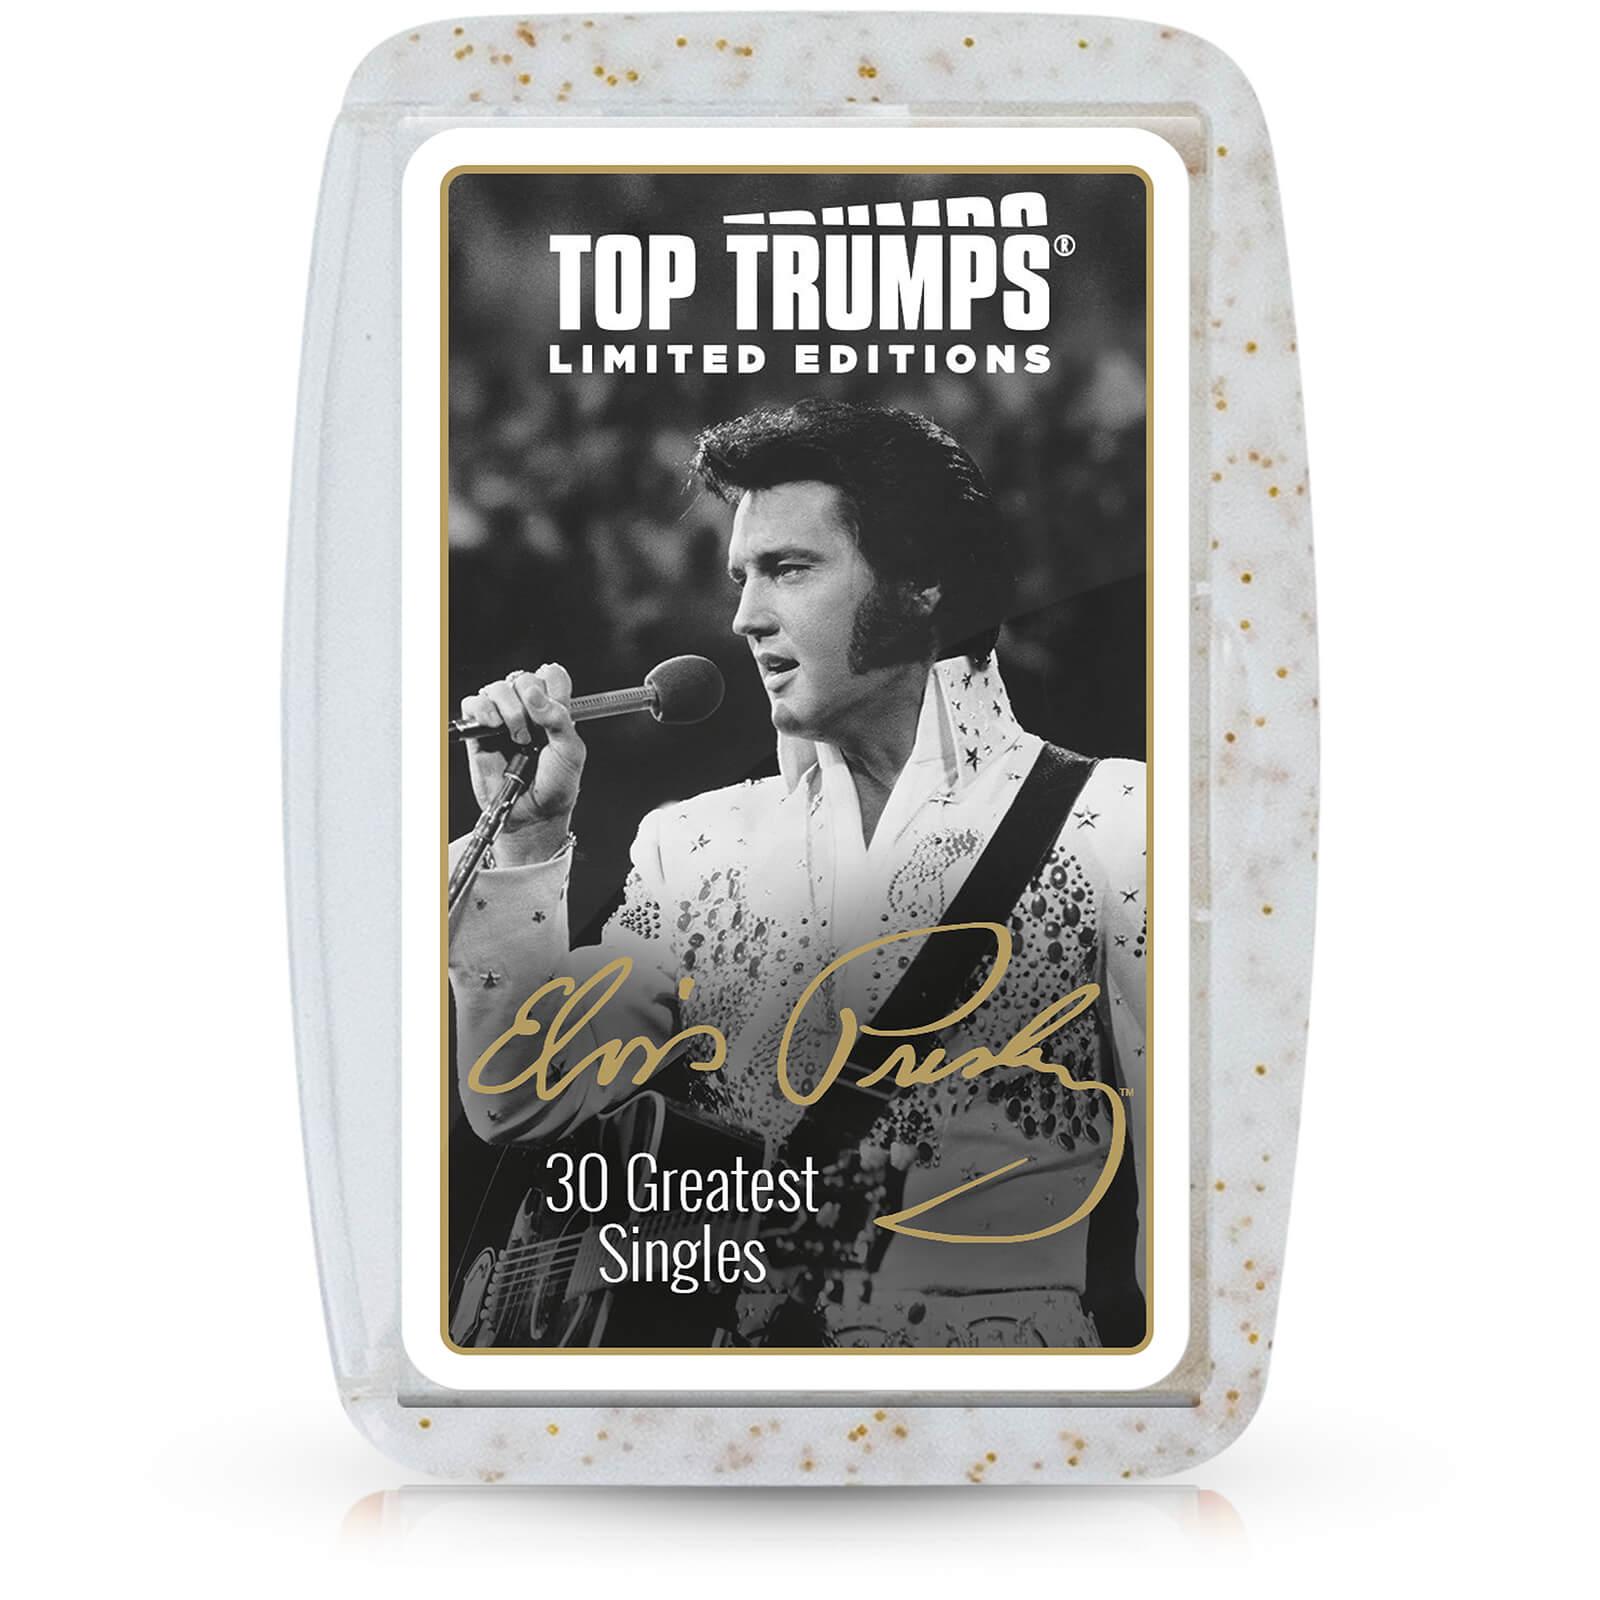 Image of Top Trumps Premium Card Game - Elvis Presley Edition